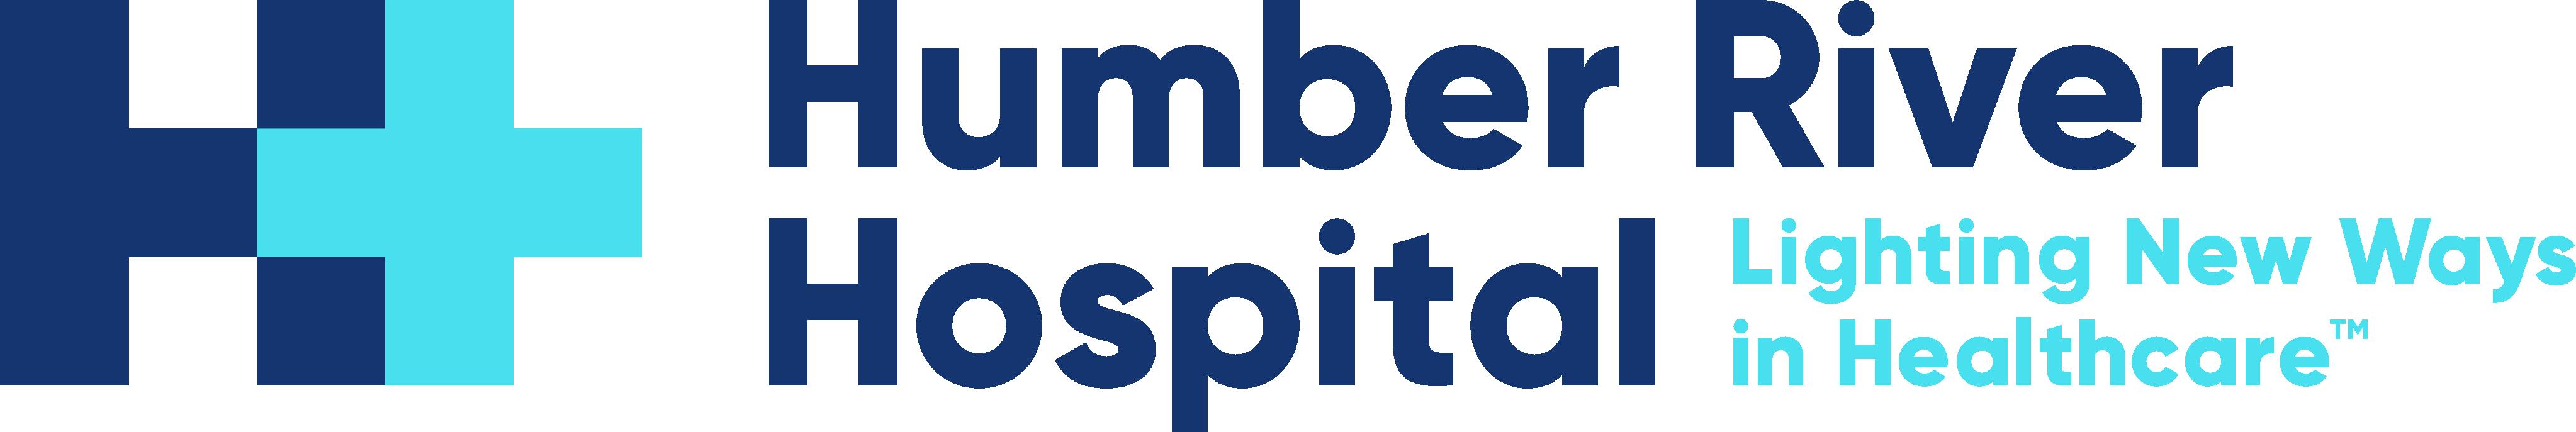 Logo for Humber River Hospital